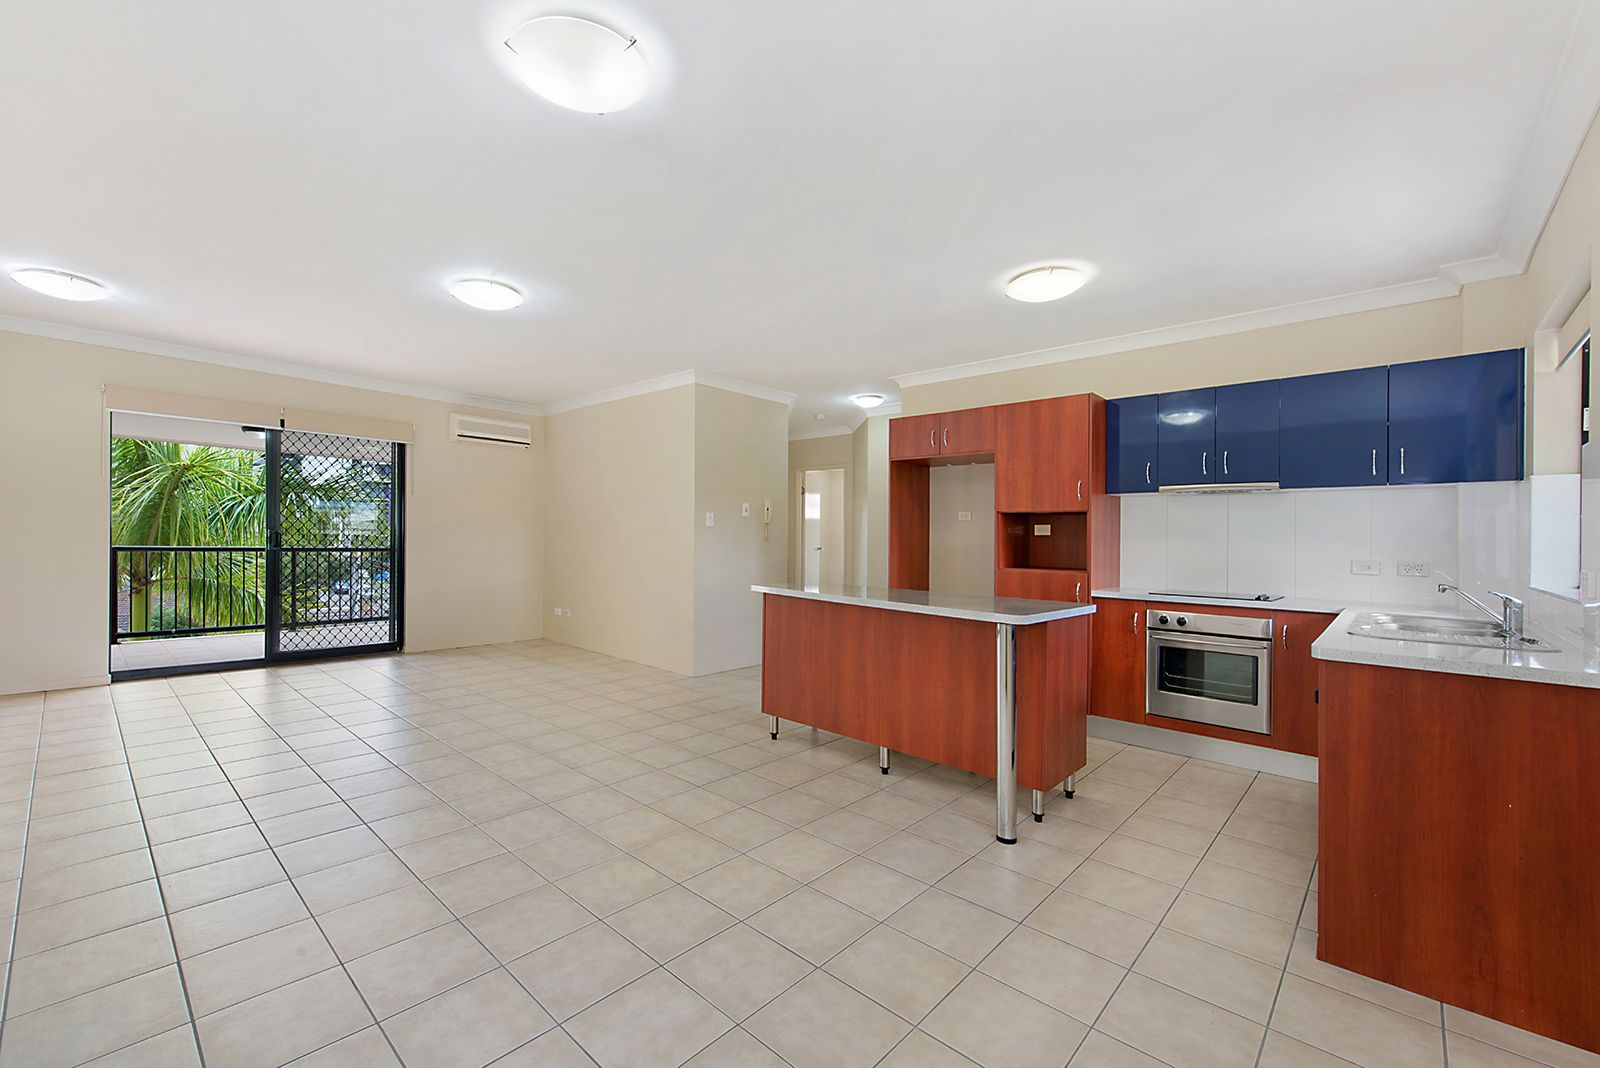 15/44 Kelburn Street, Upper Mount Gravatt QLD 4122, Image 0